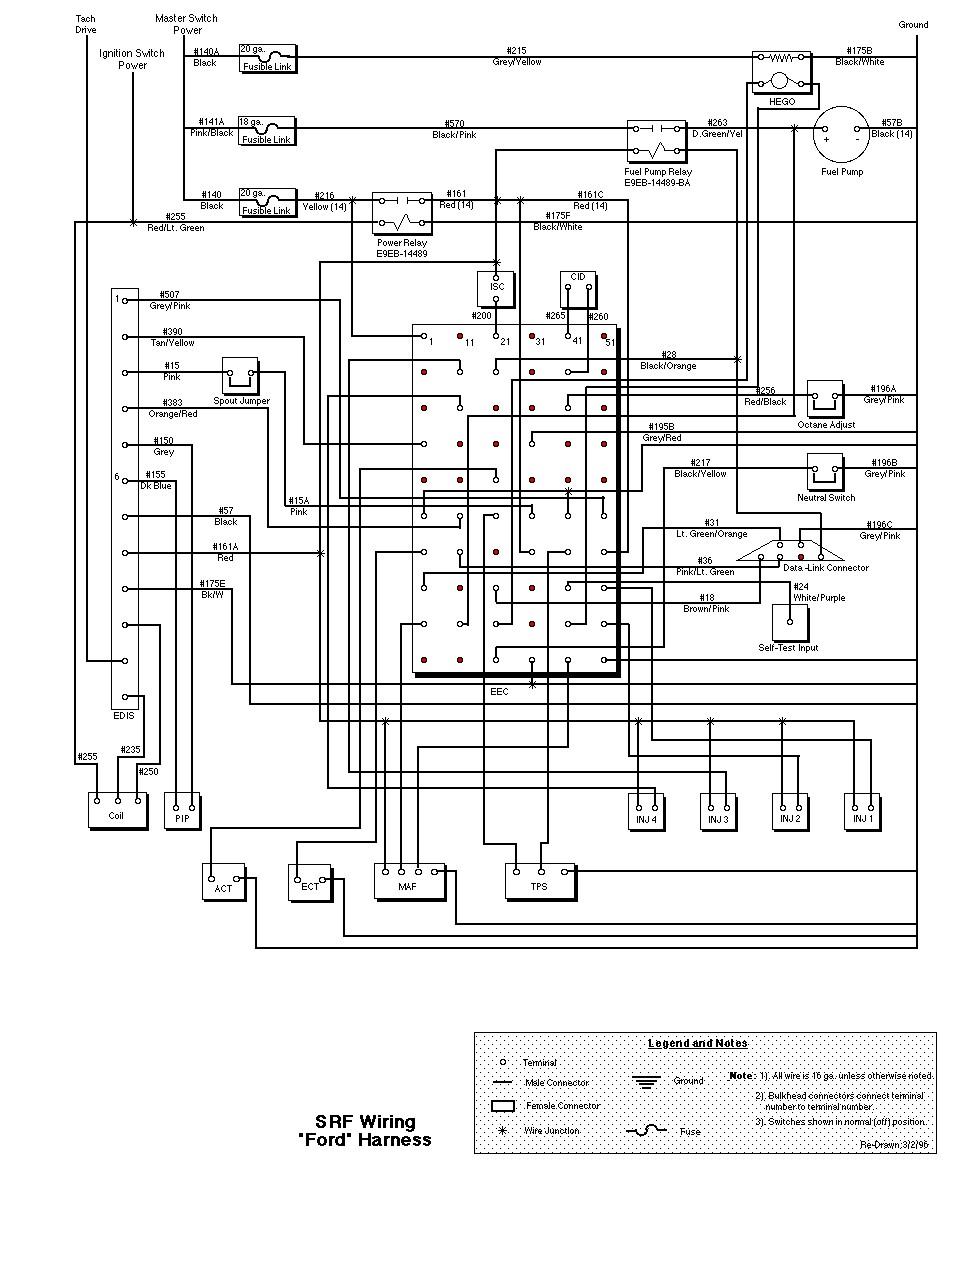 Exelent Ford L9000 Wiring Diagram For Heater System Festooning ...